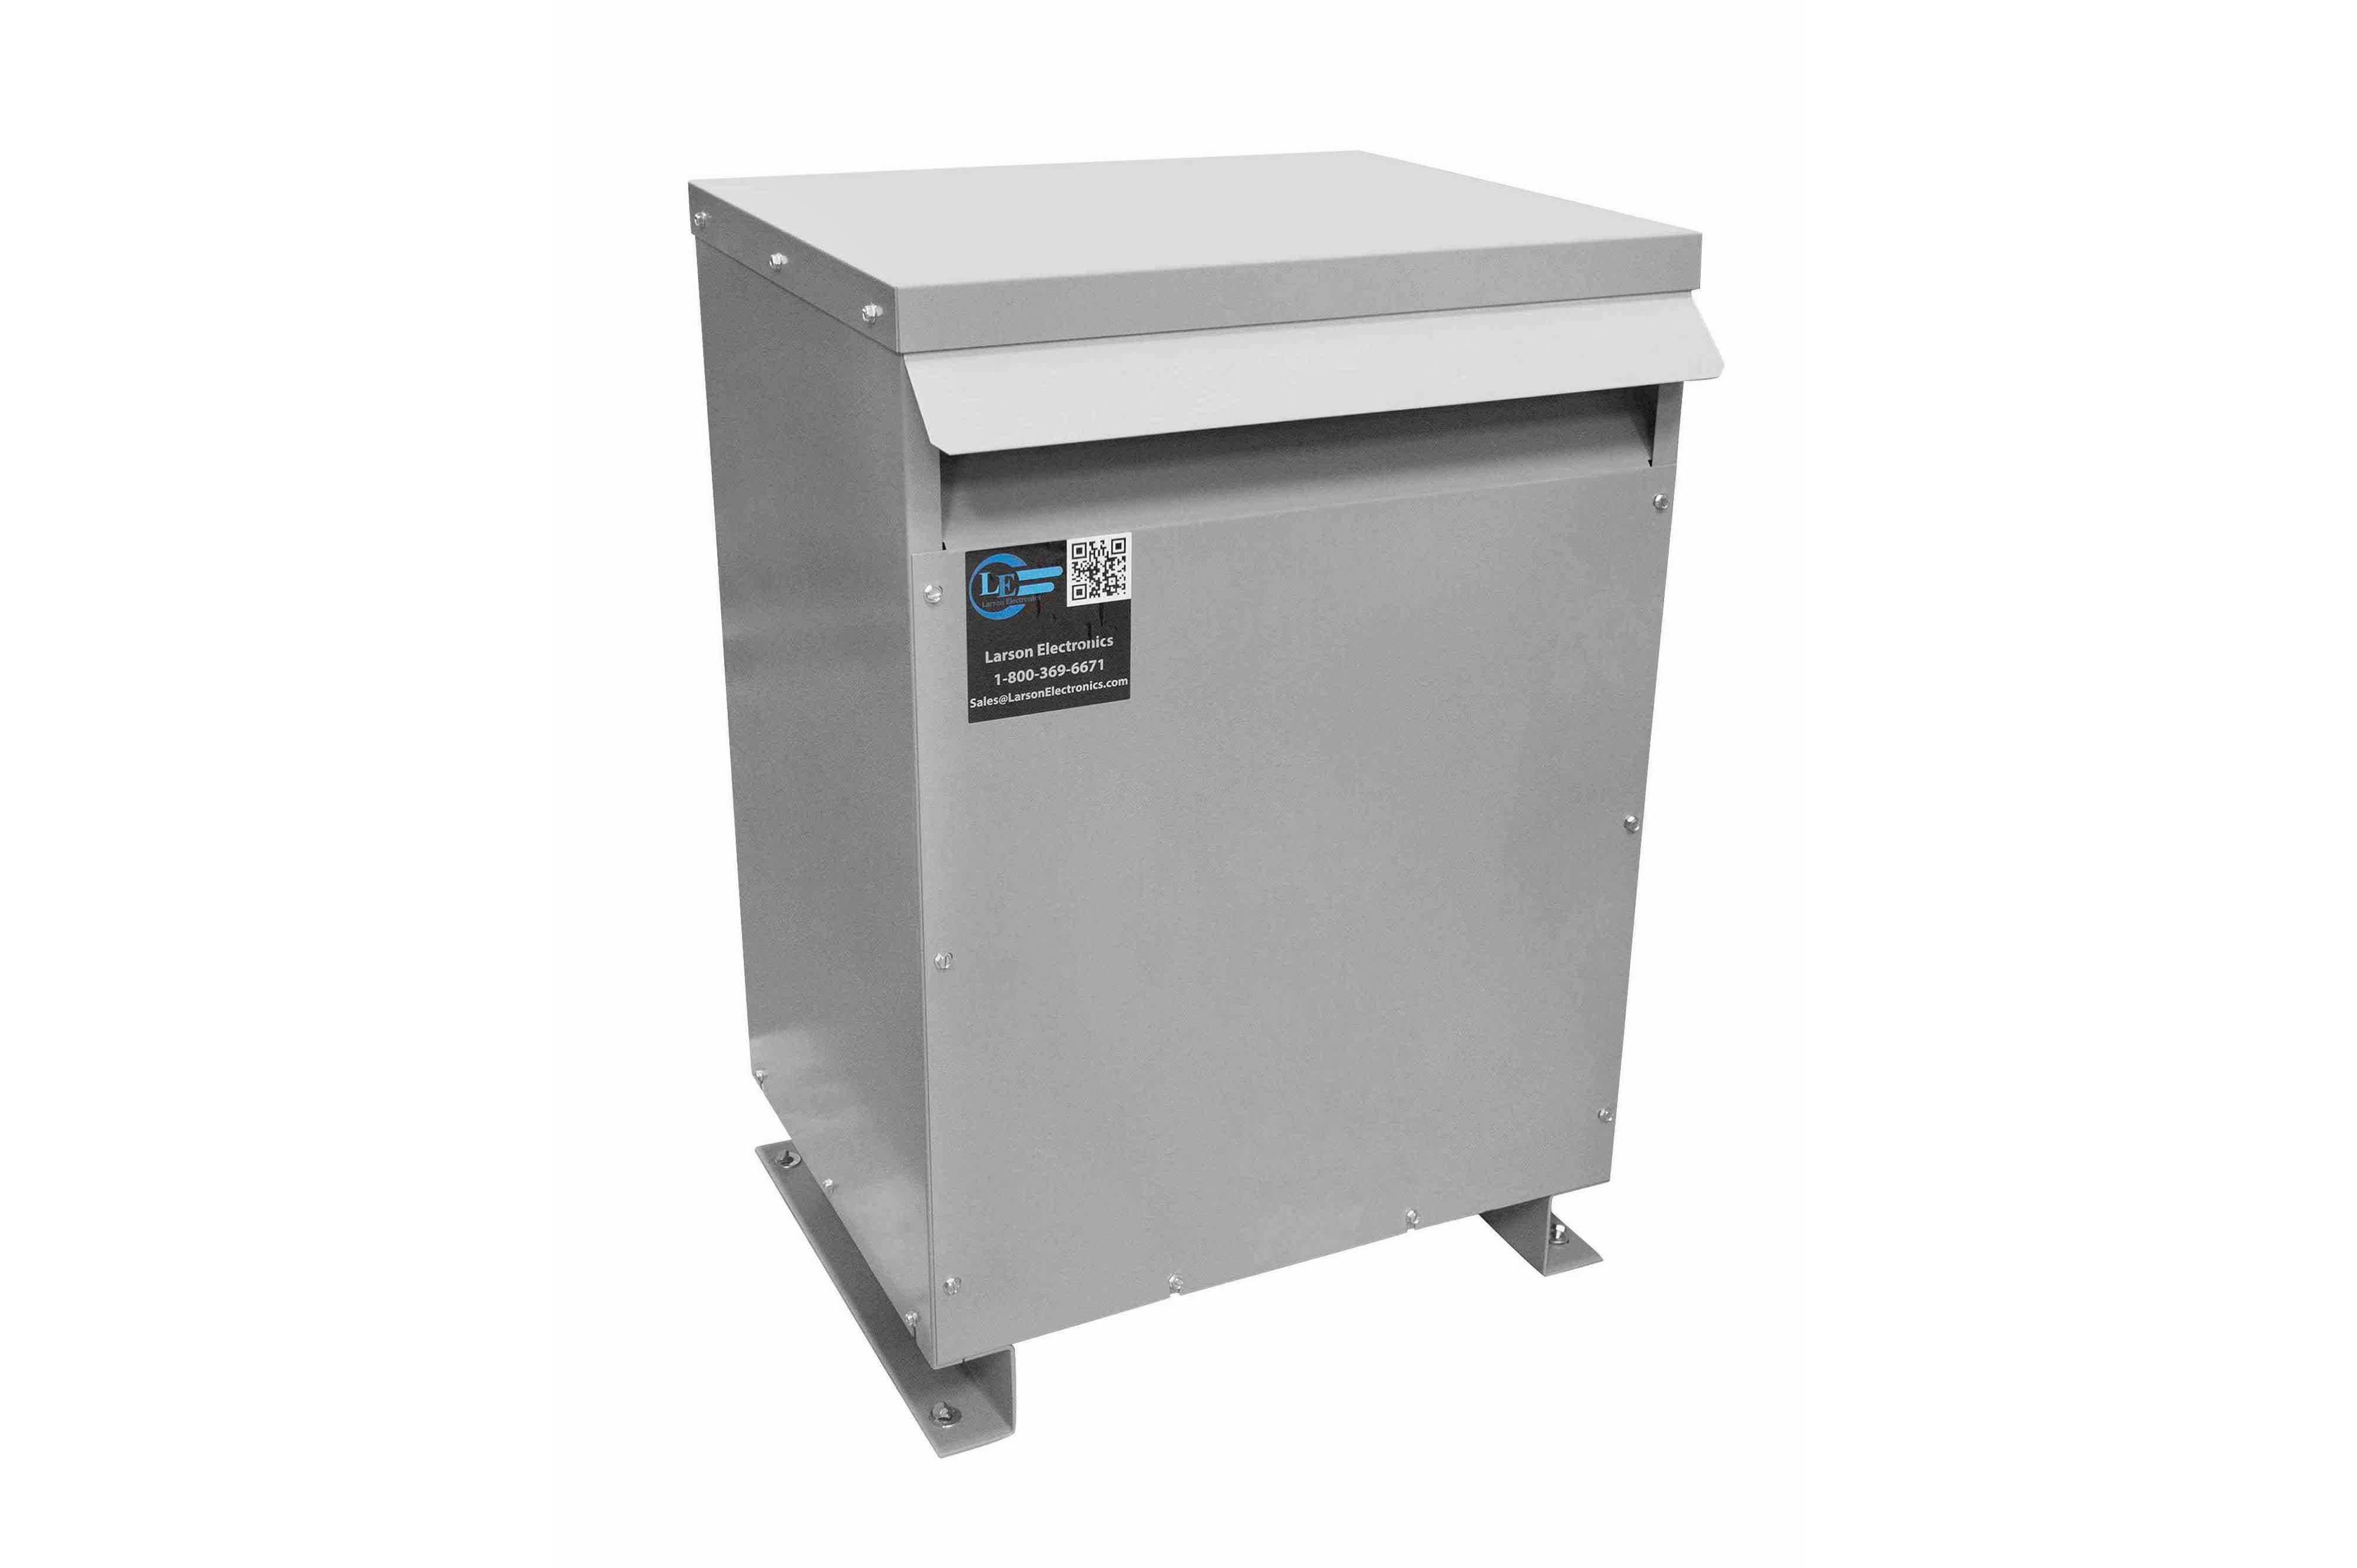 10 kVA 3PH Isolation Transformer, 230V Wye Primary, 480Y/277 Wye-N Secondary, N3R, Ventilated, 60 Hz